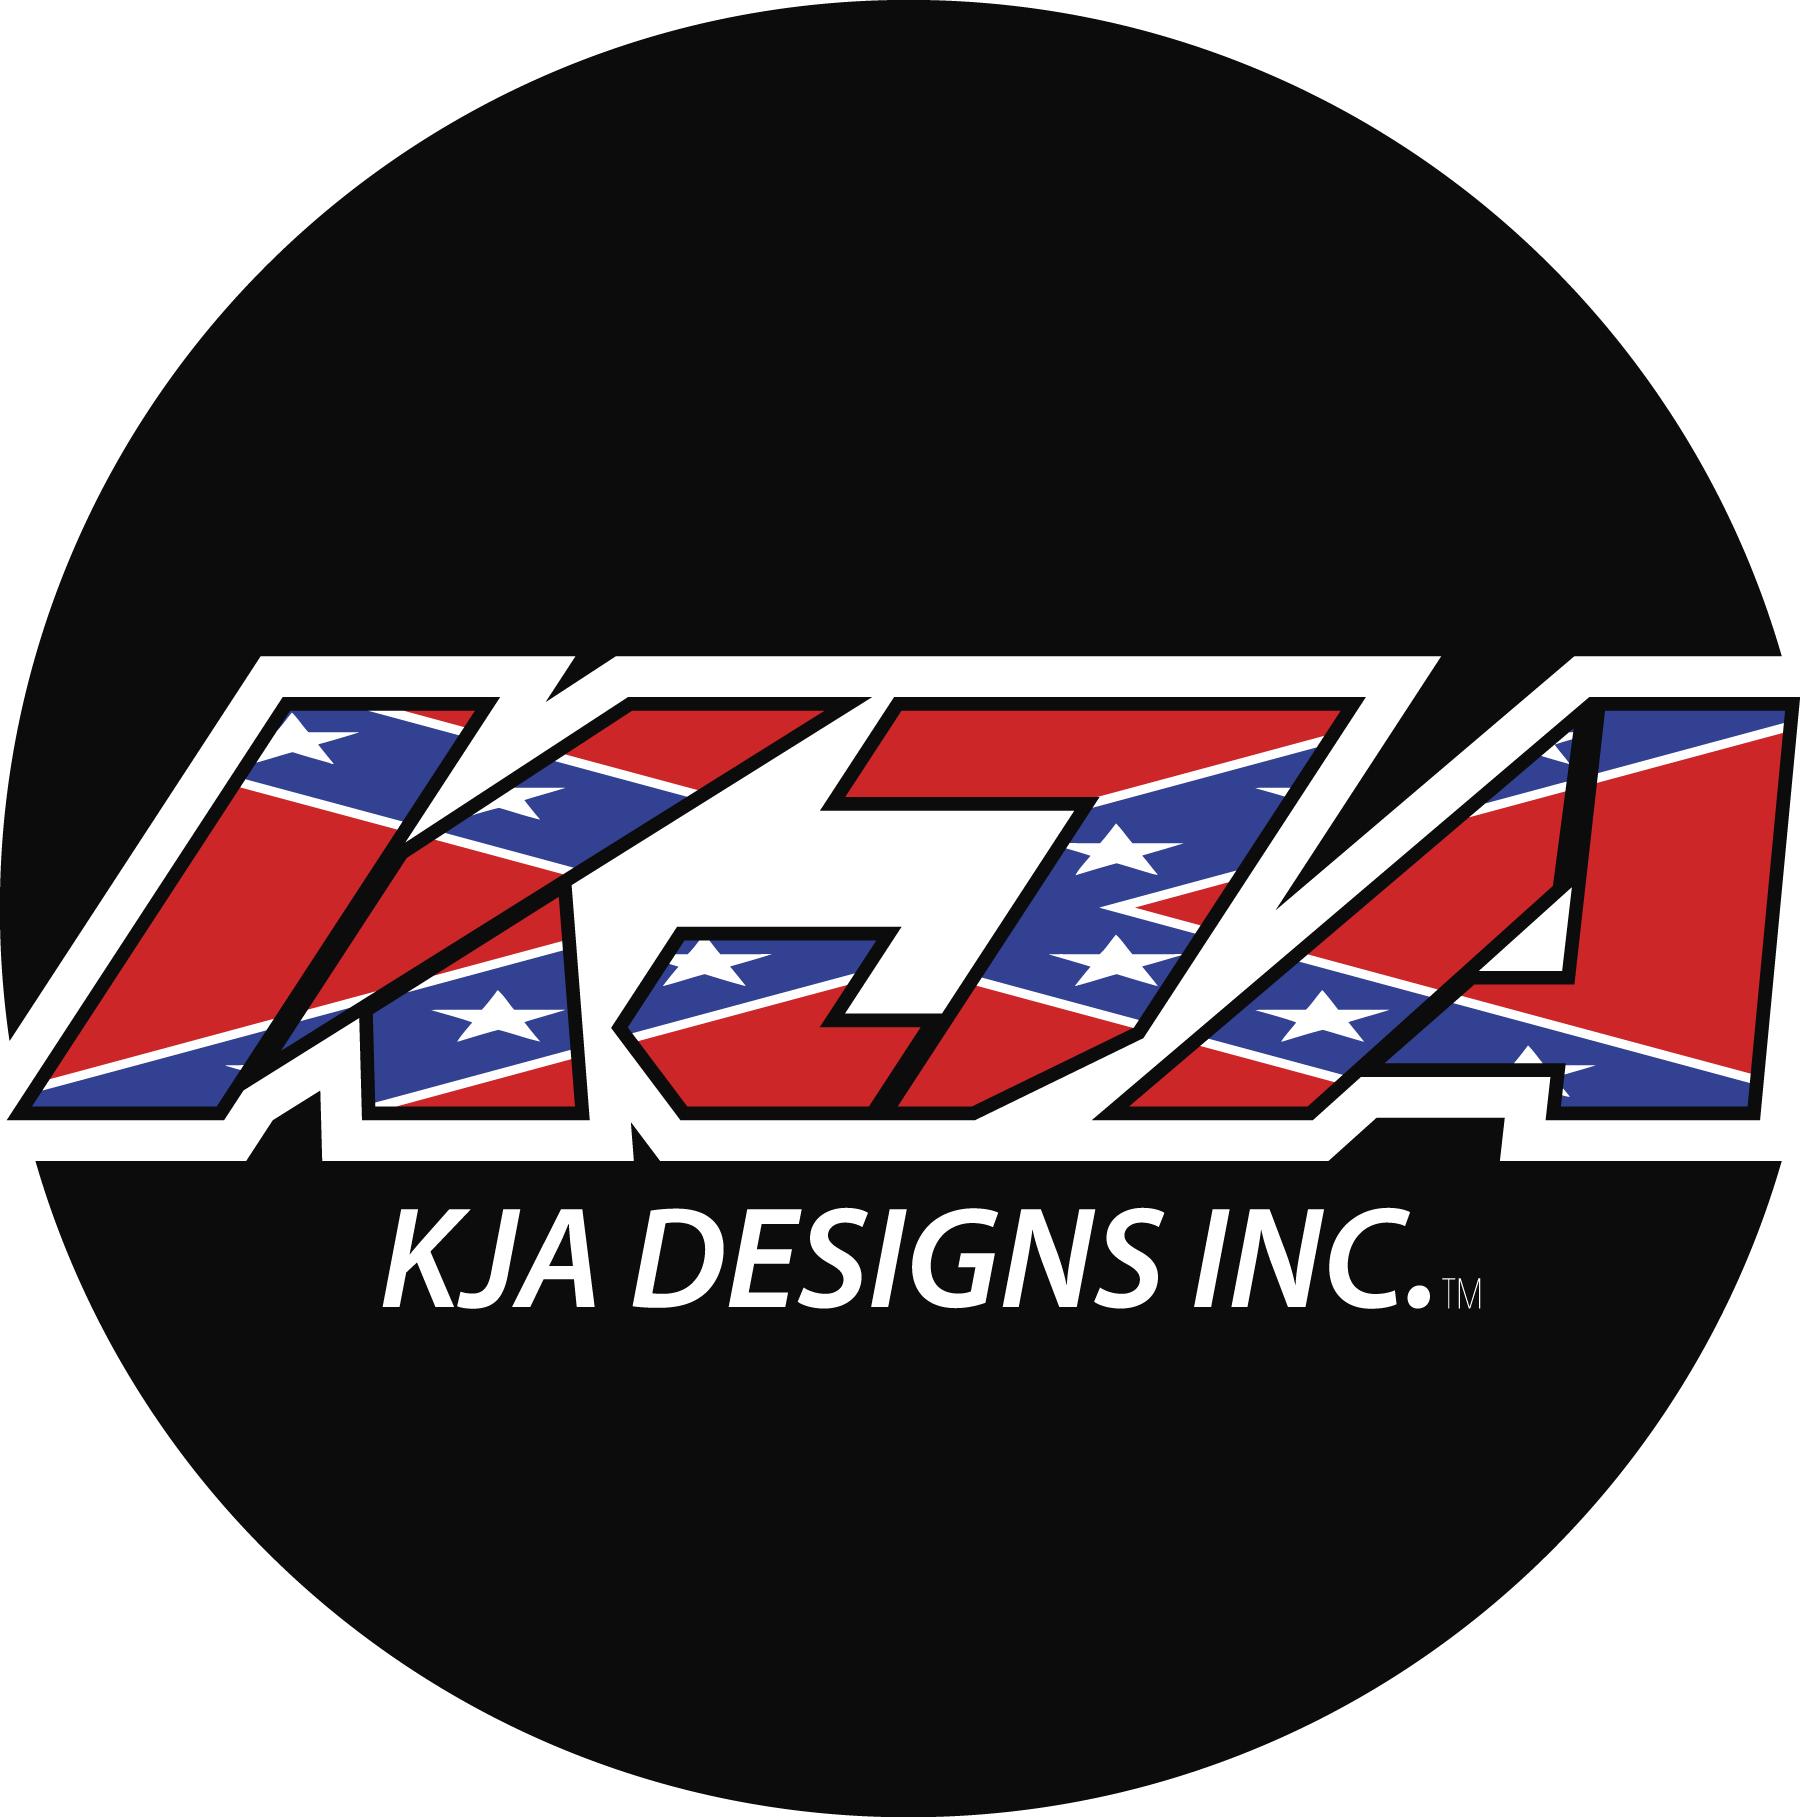 KJA Designs Inc.™ 3A on site